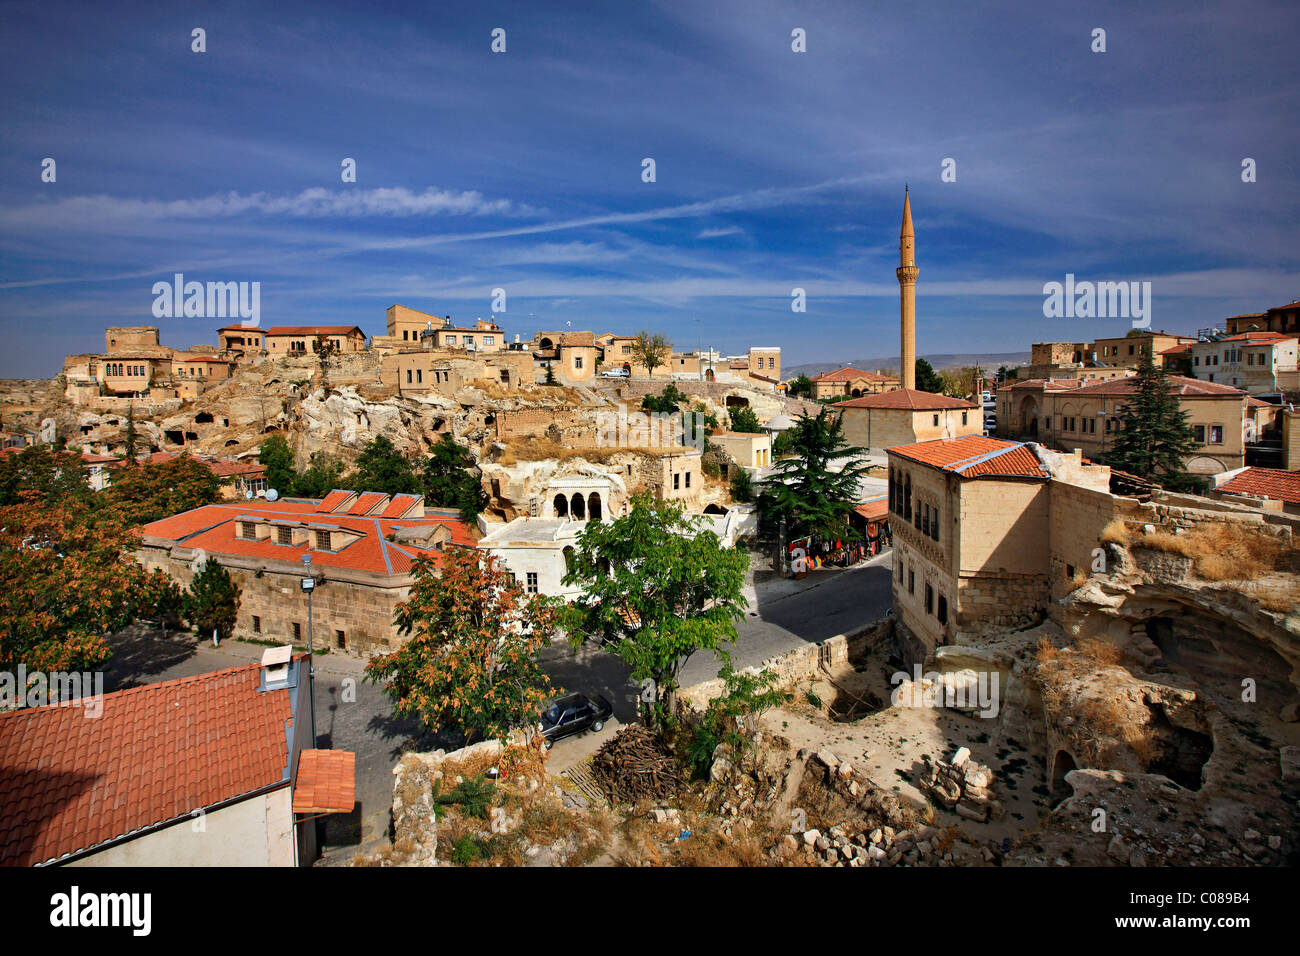 Sinasos ('Mustafapasa') one of the most beautiful towns in Cappadocia, Nevsehir, Turkey - Stock Image